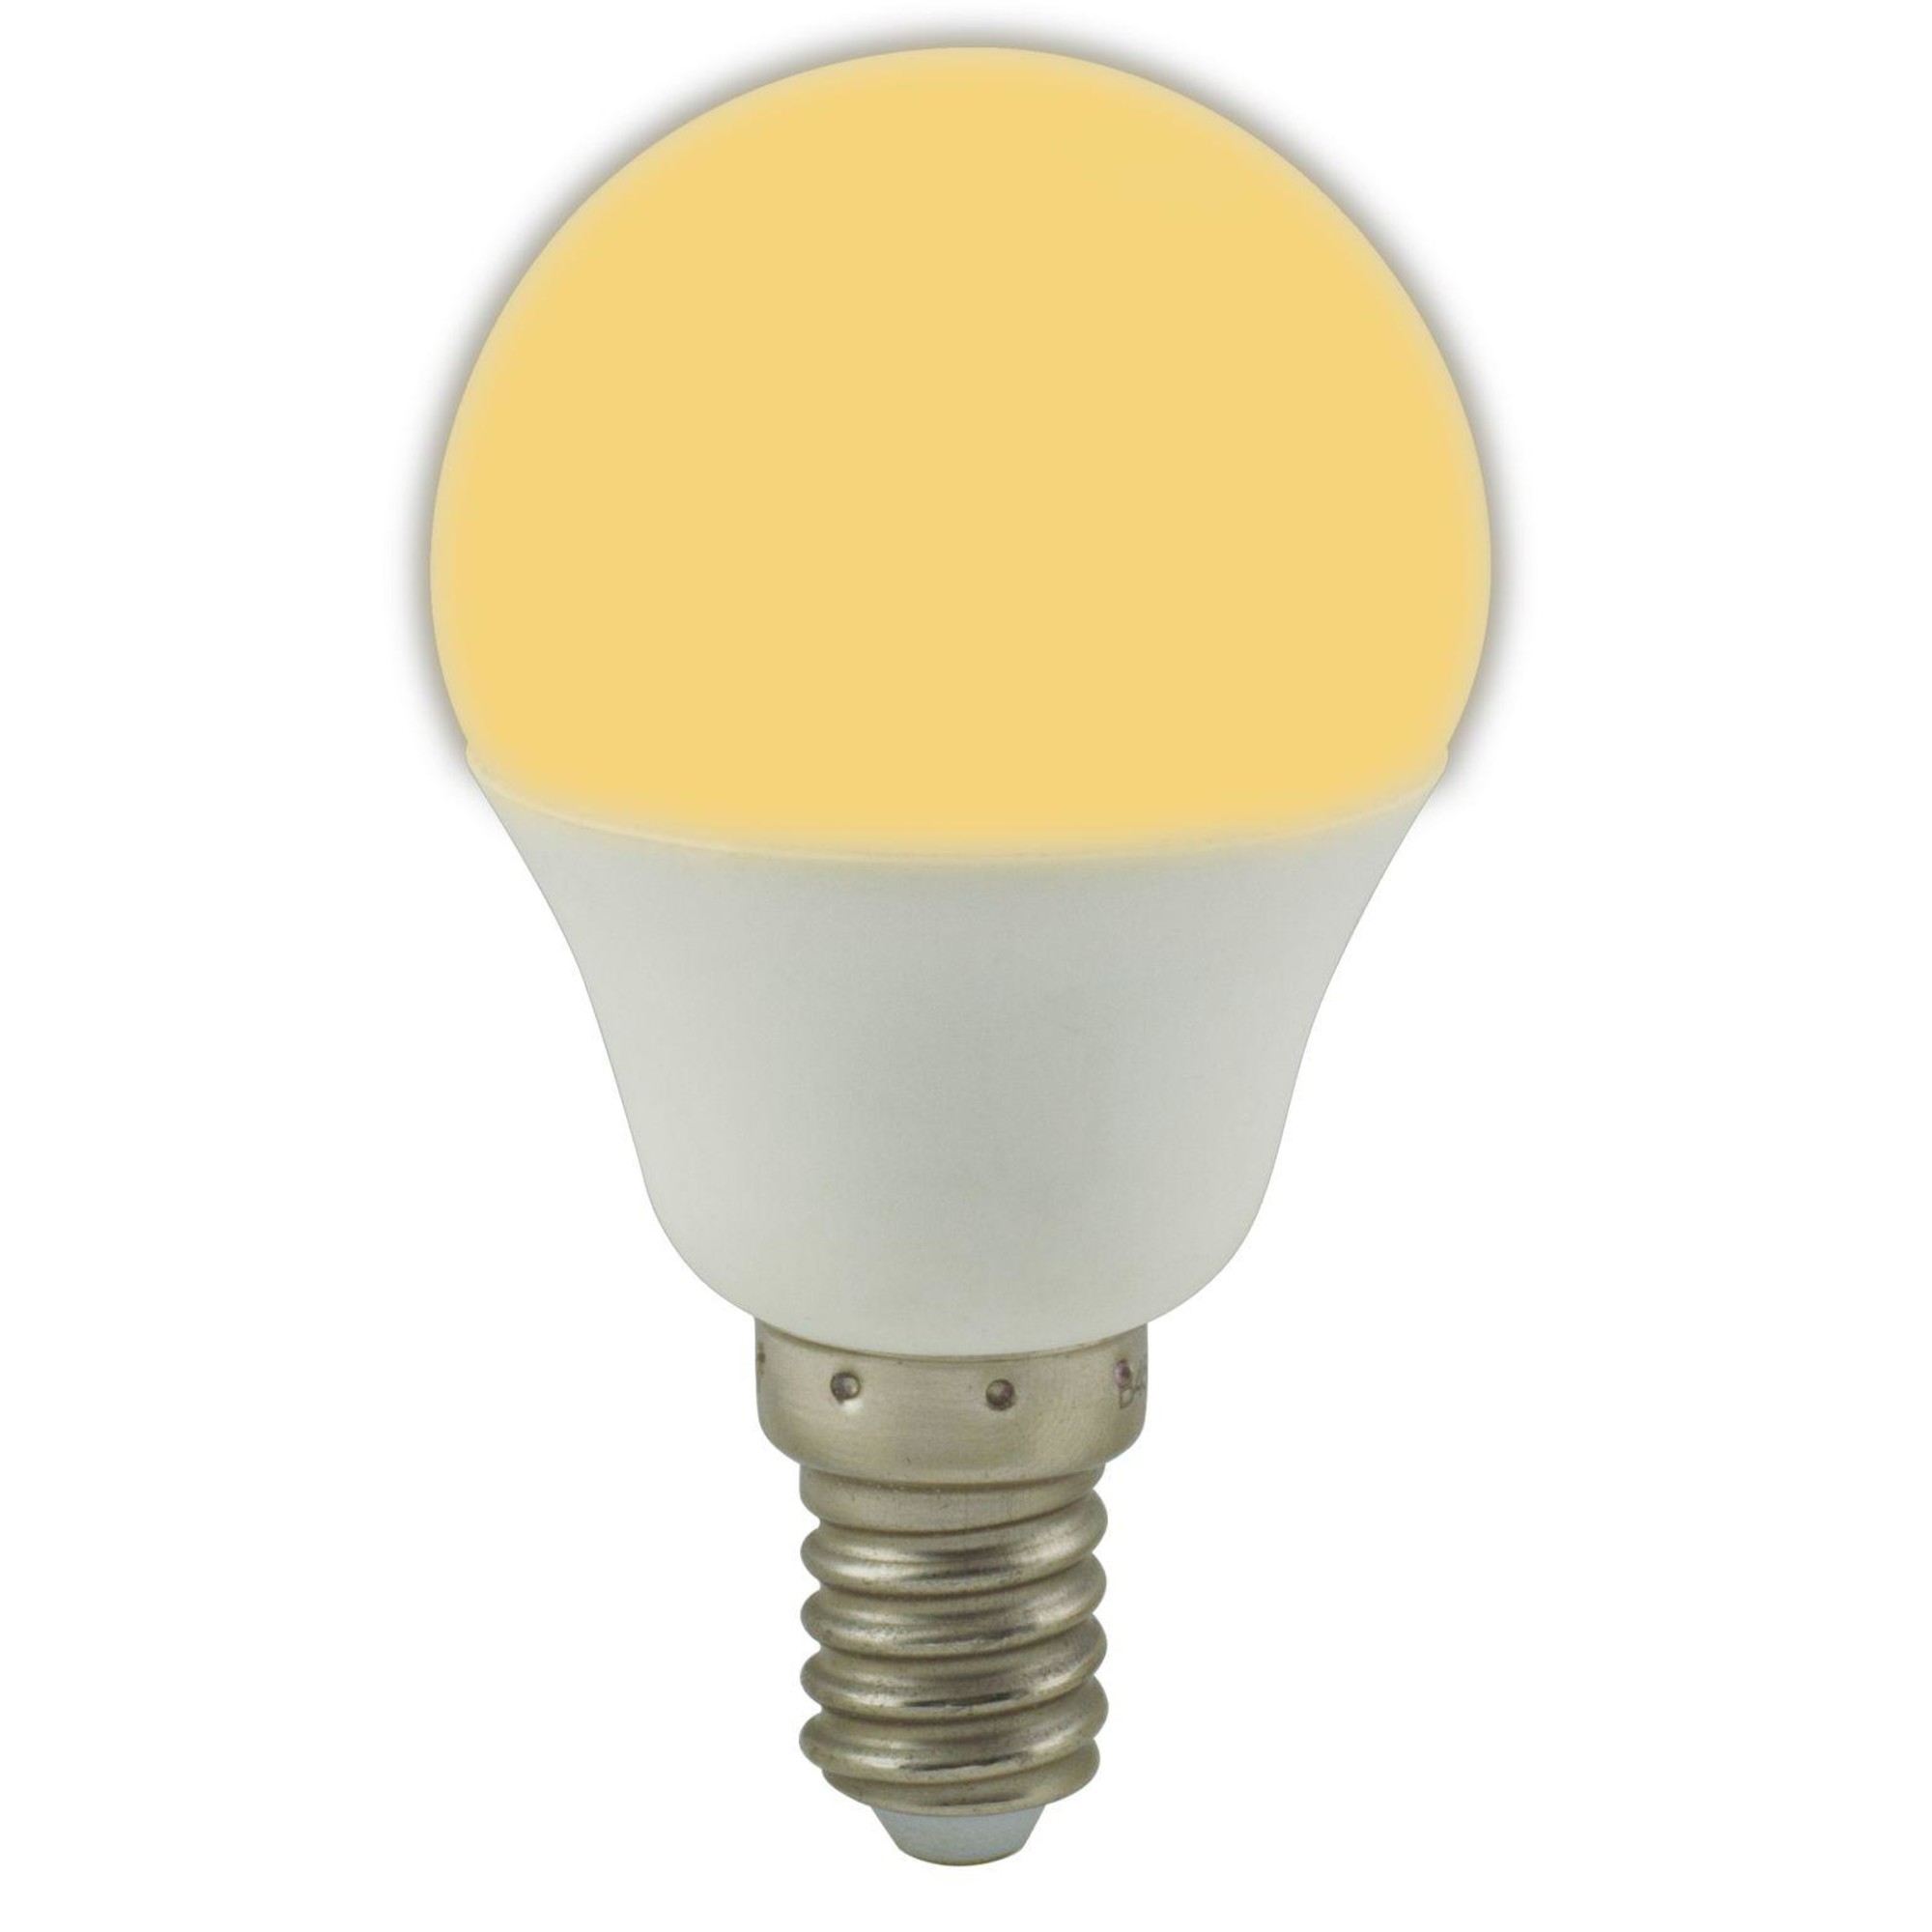 Лампа Ecola Premium светодионая E14 8 Вт шар 640 Лм теплый свет